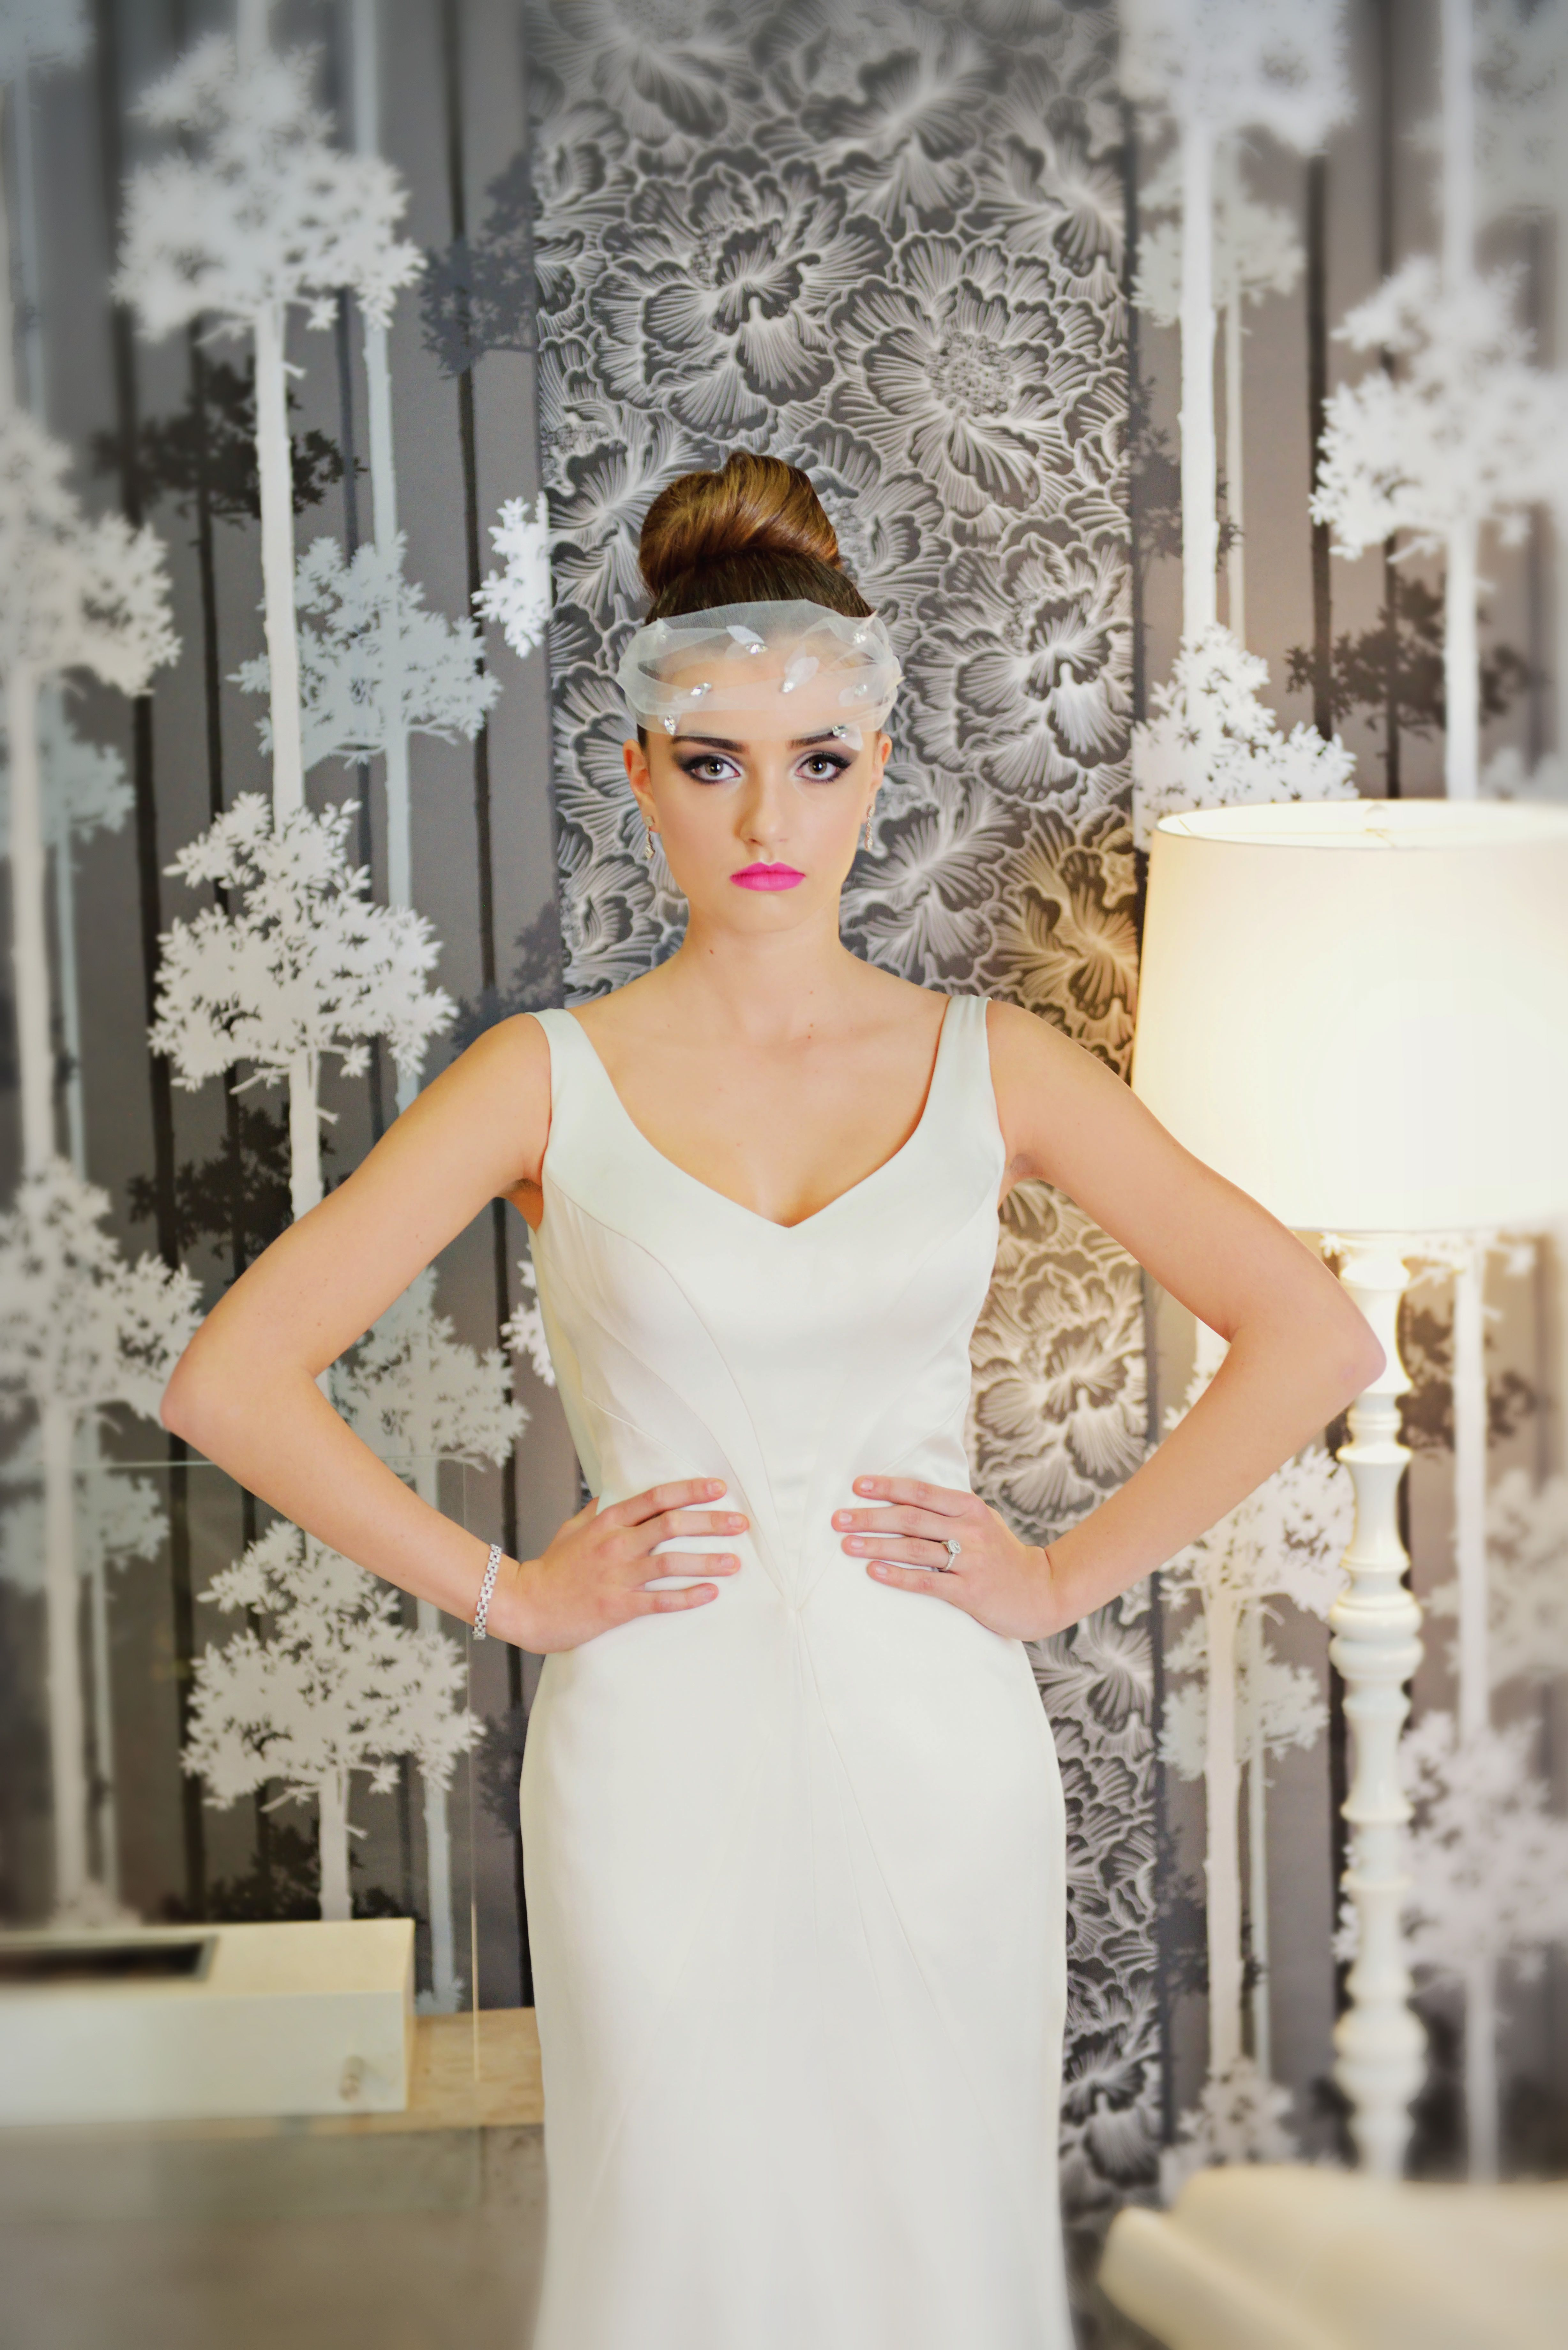 Matthew christopher luna gown from little white dress bridal shop in matthew christopher luna gown from little white dress bridal shop in denver colorado mywedding junglespirit Images